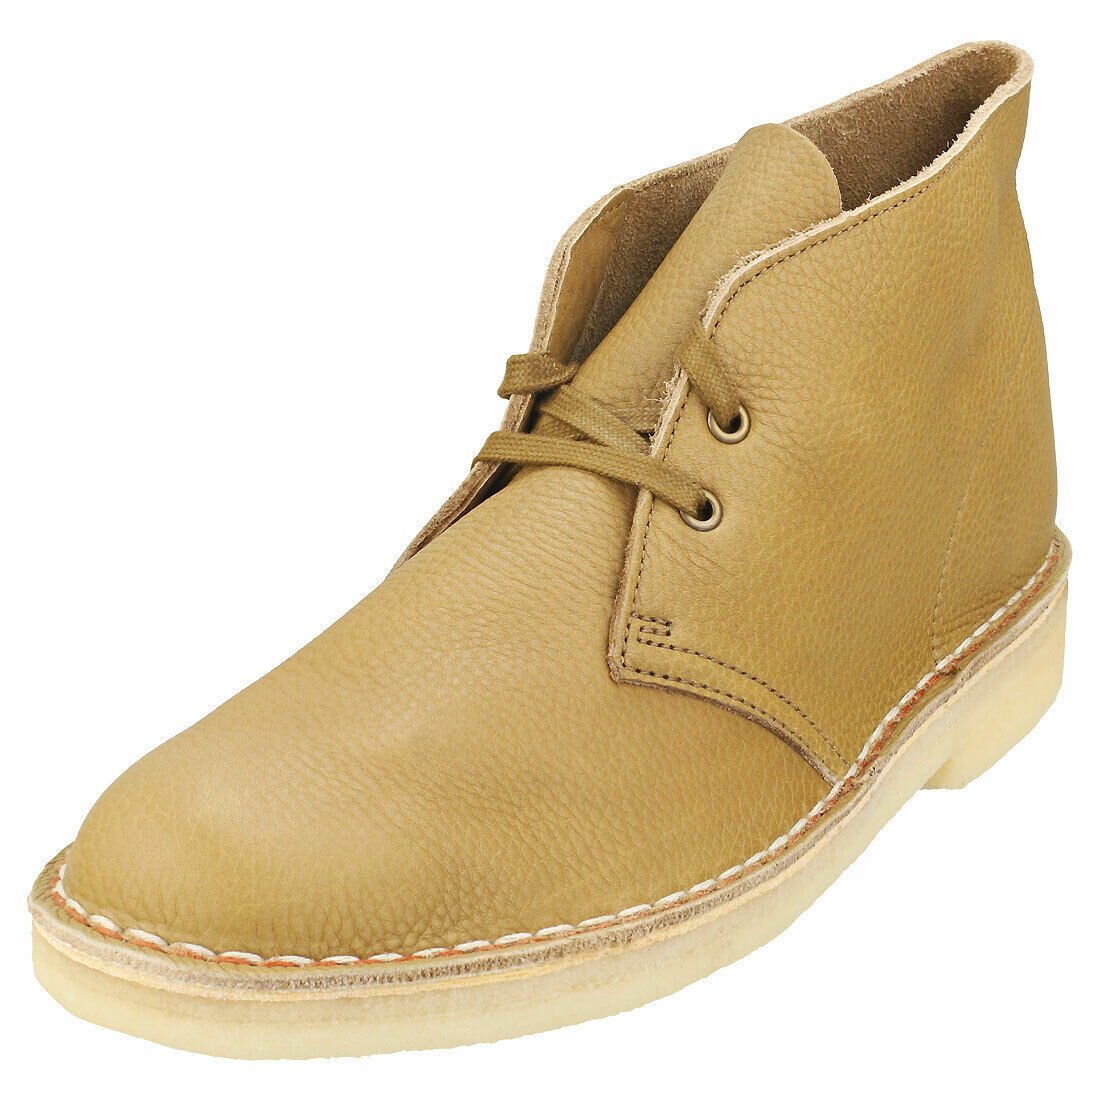 Clarks Originals Desert Boot Mens Dark Olive Desert Boots - 11 UK